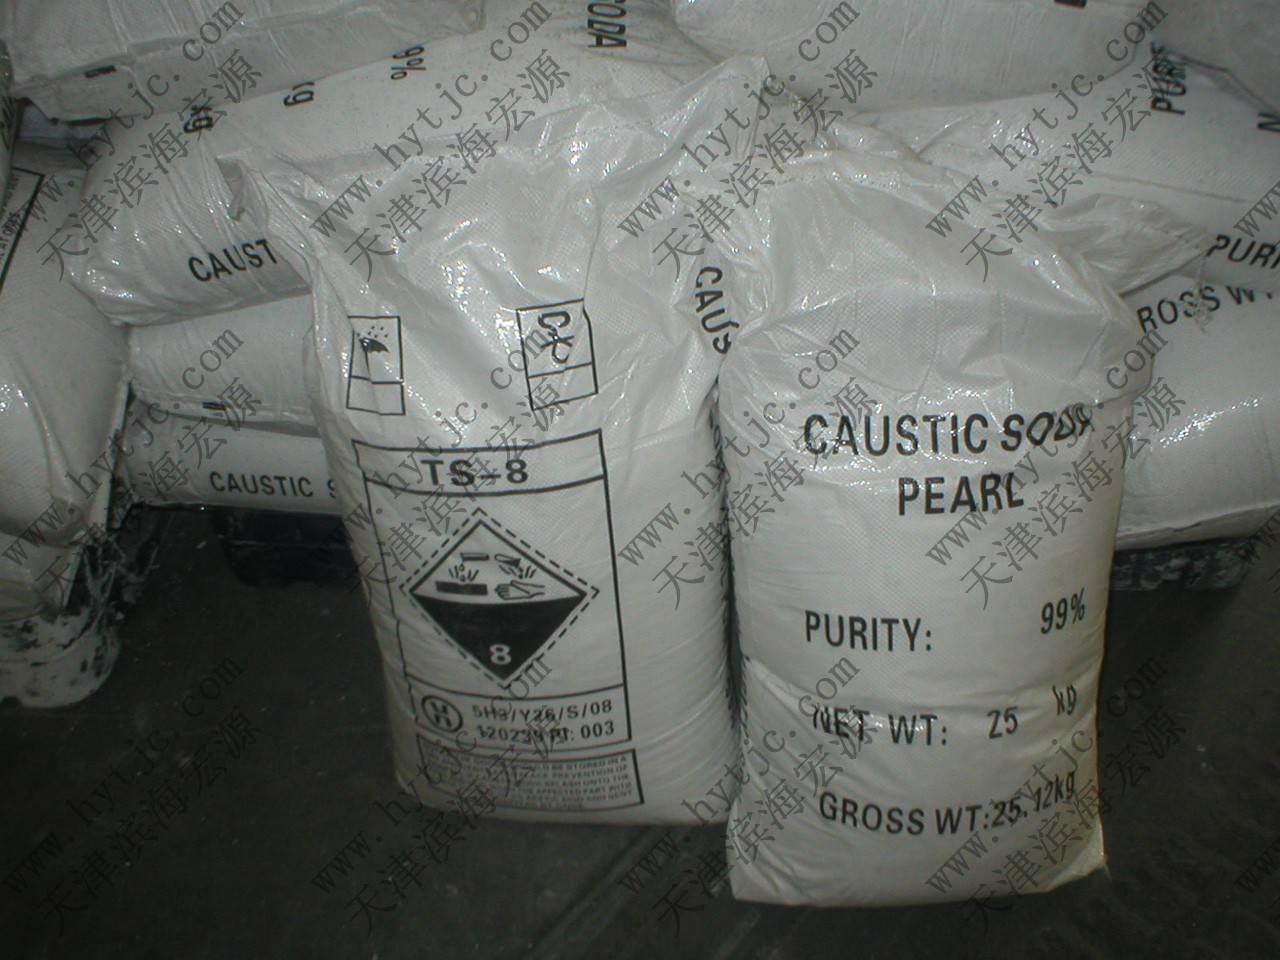 Caustic soda pearls /beads/prills (Sodium Hydroxide Solid)